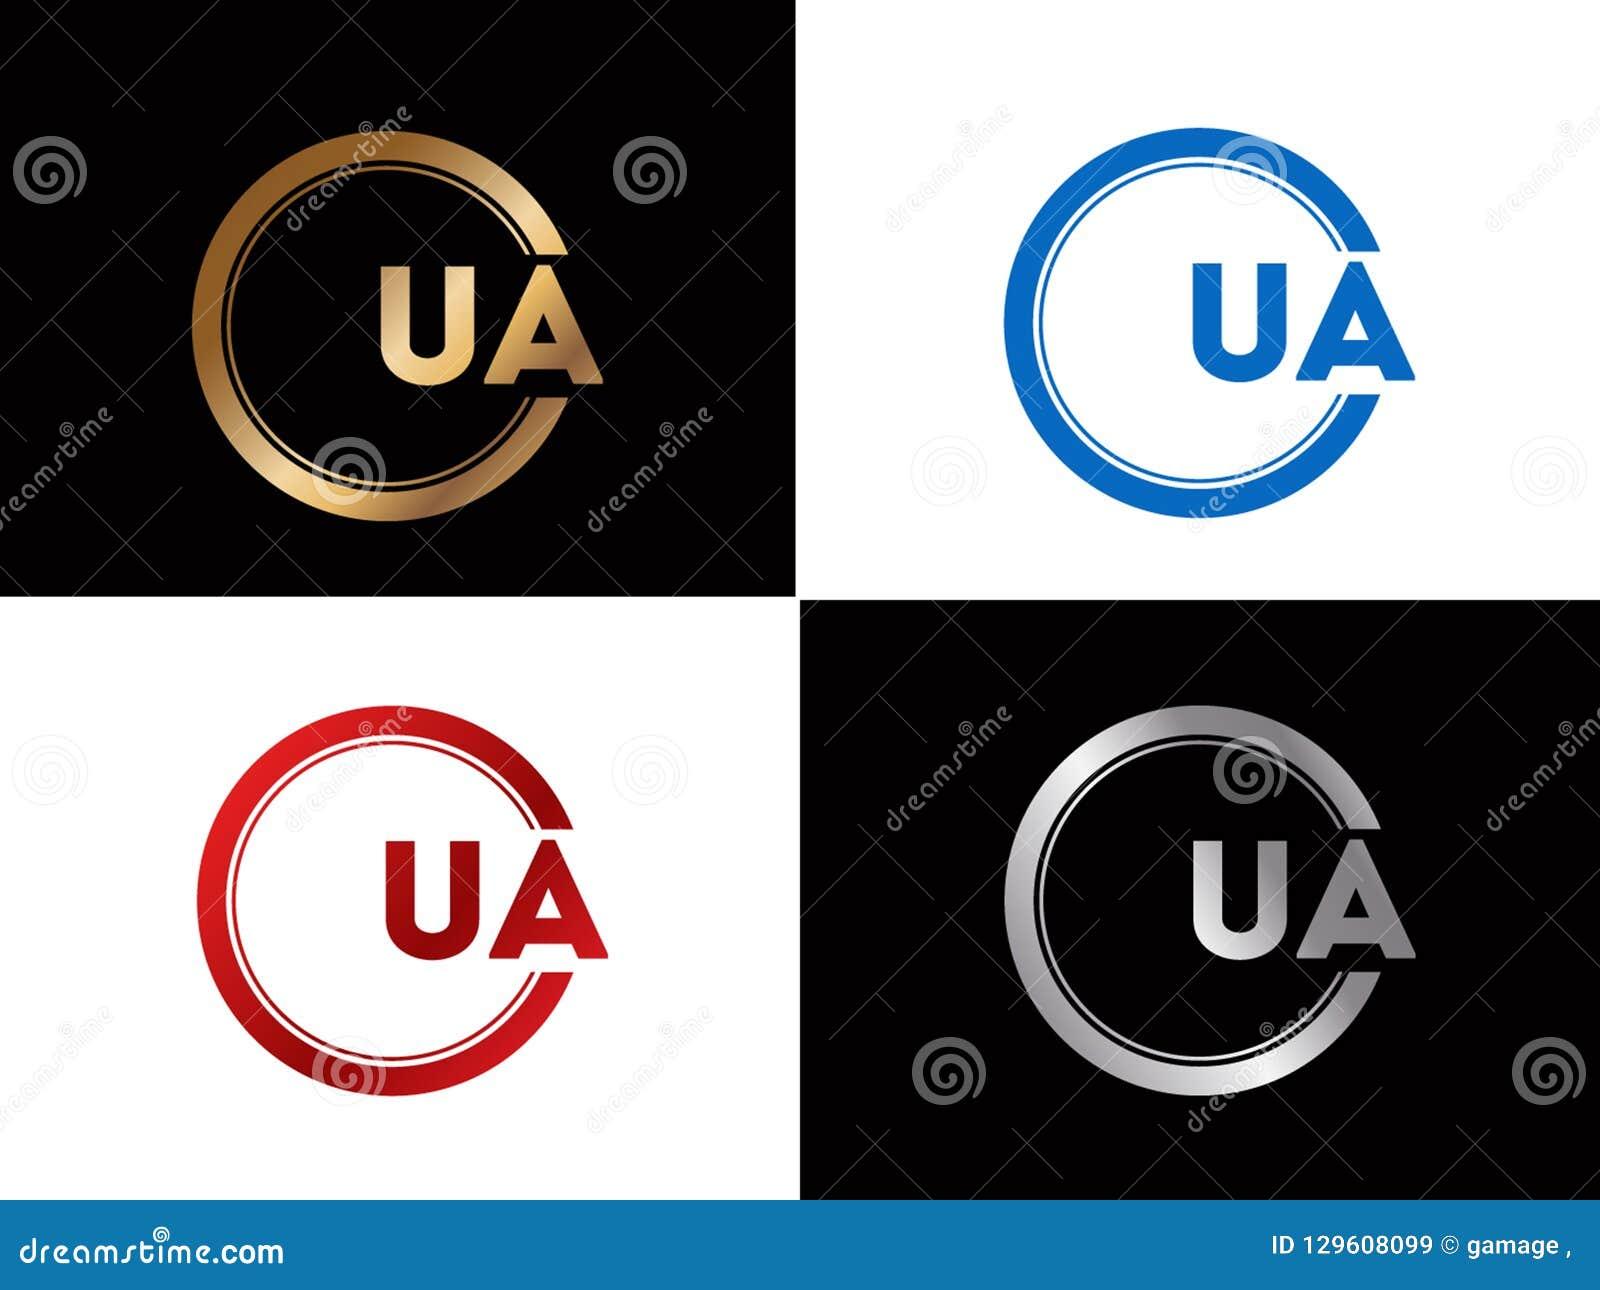 Ua Text Gold Black Silver Modern Creative Alphabet Letter Logo